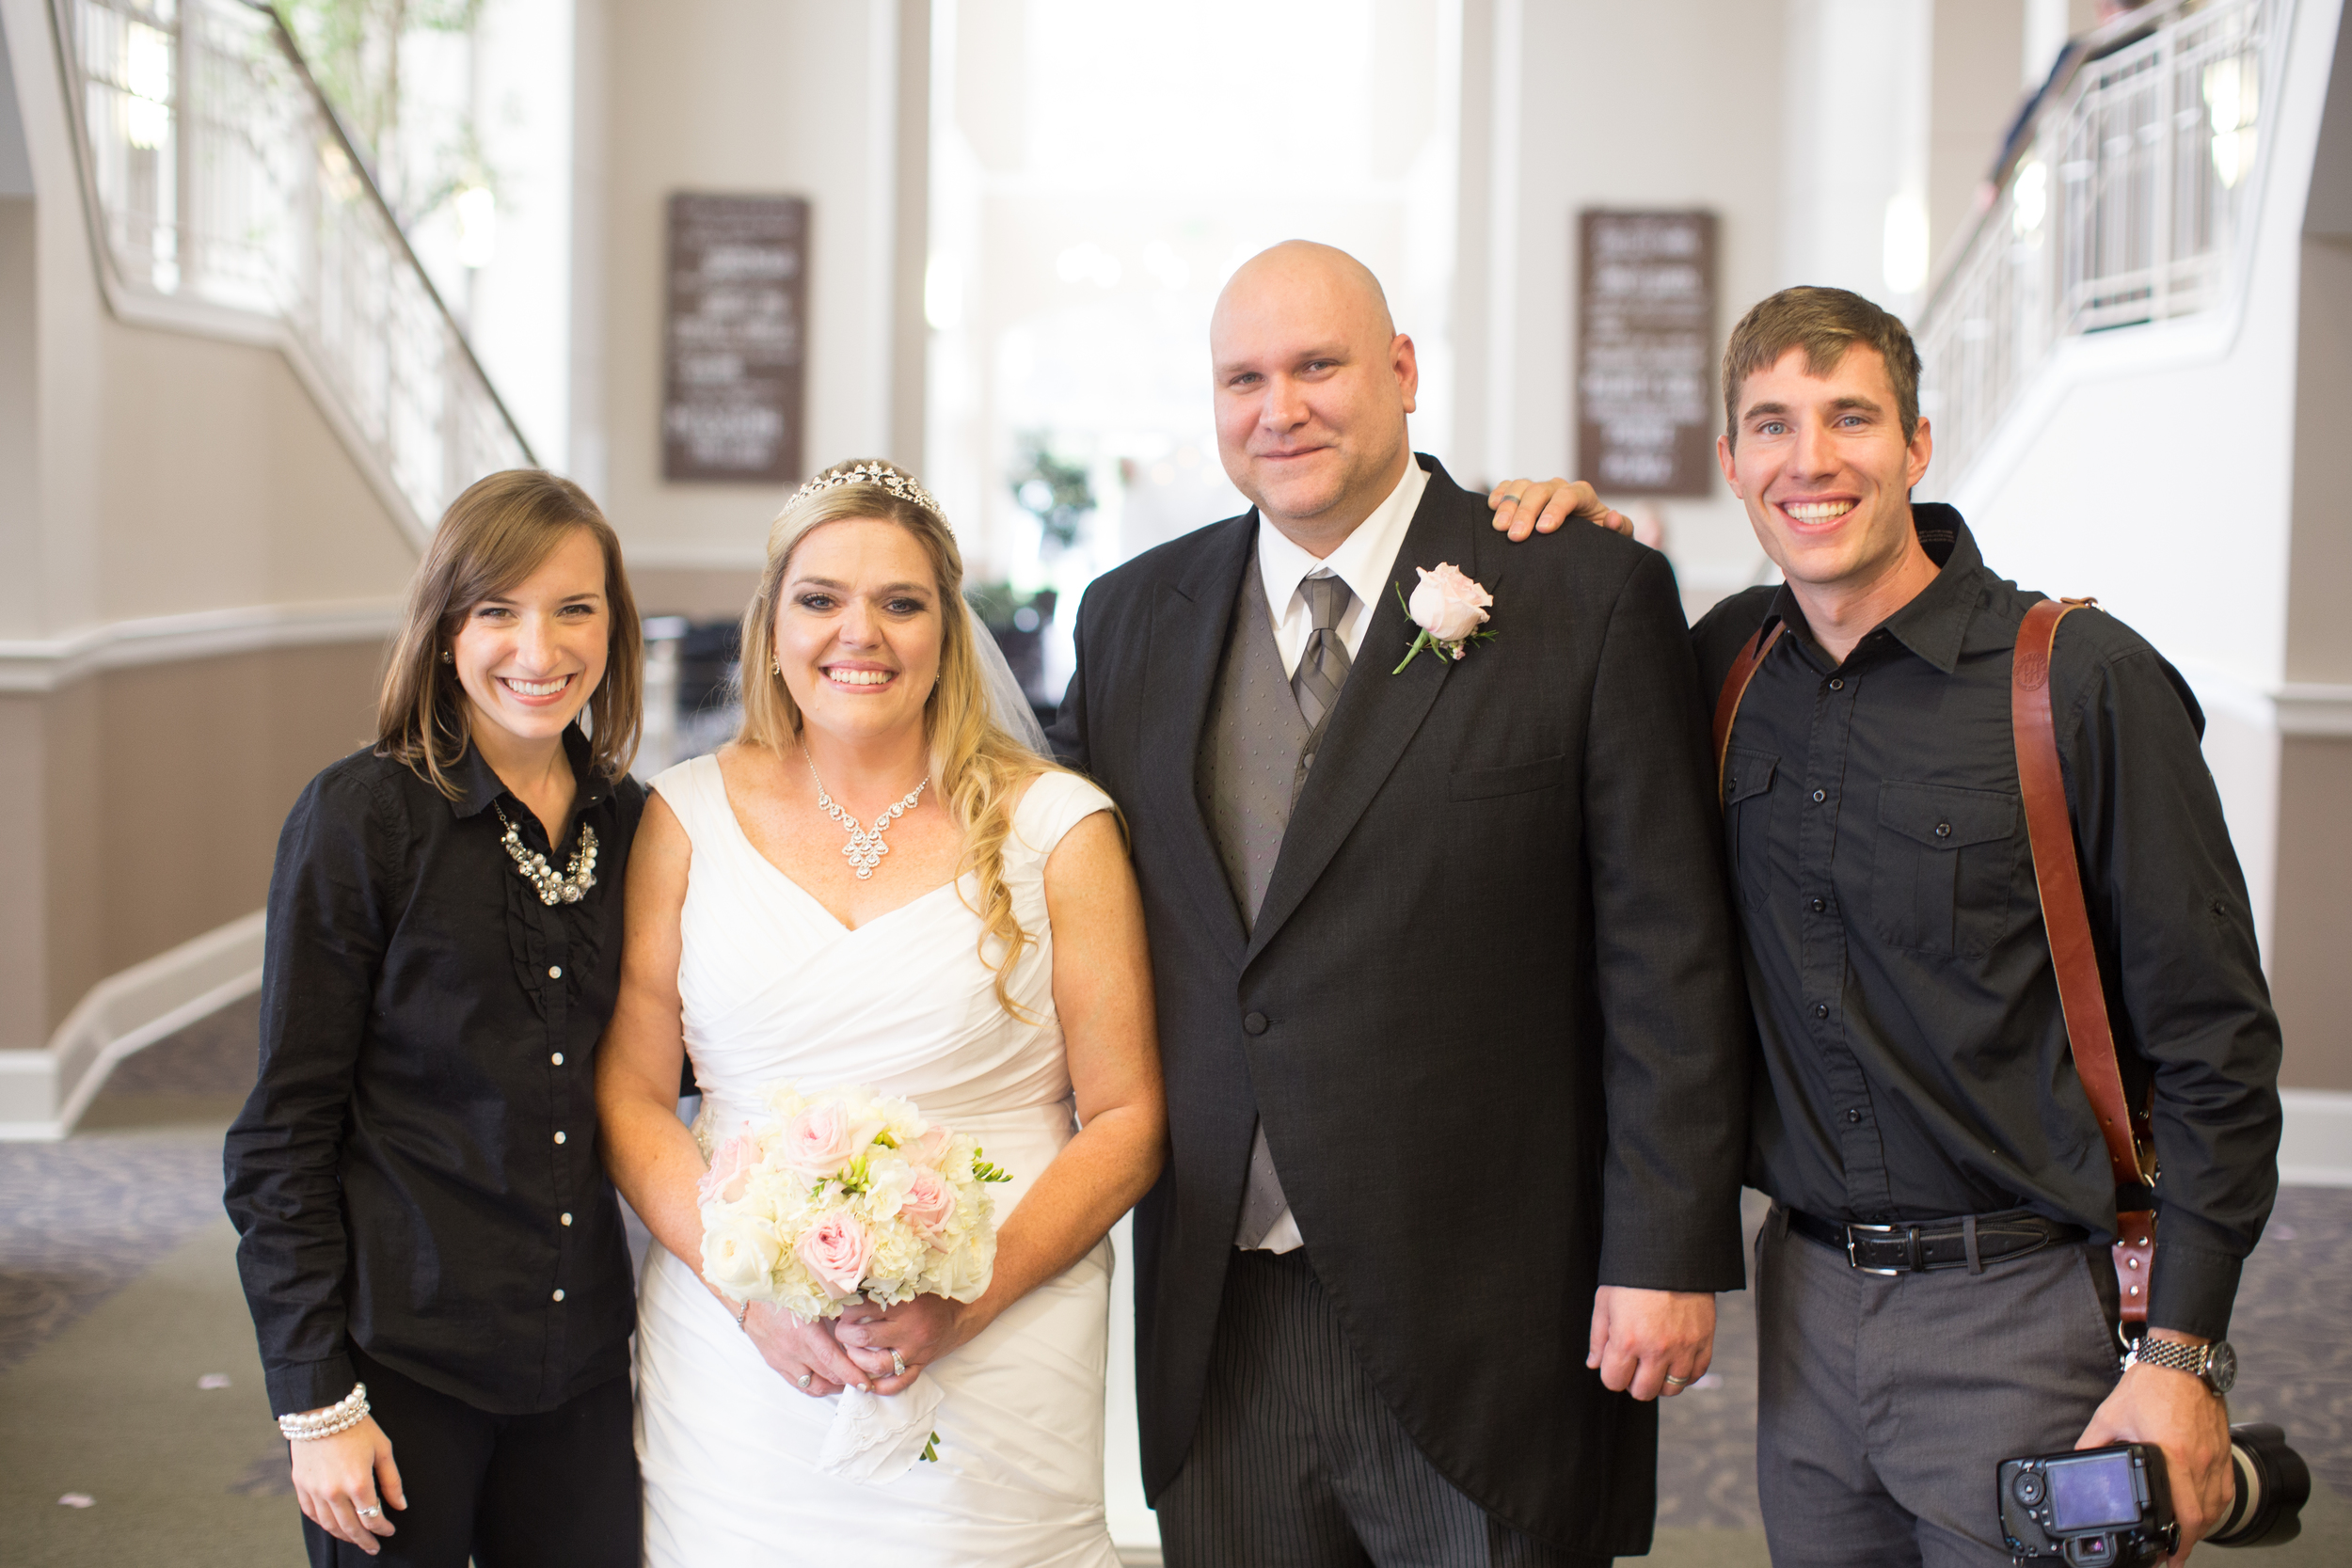 Hough_Wedding_North_Carolina_Charlotte_JonCourvillePhotography-1-5.jpg